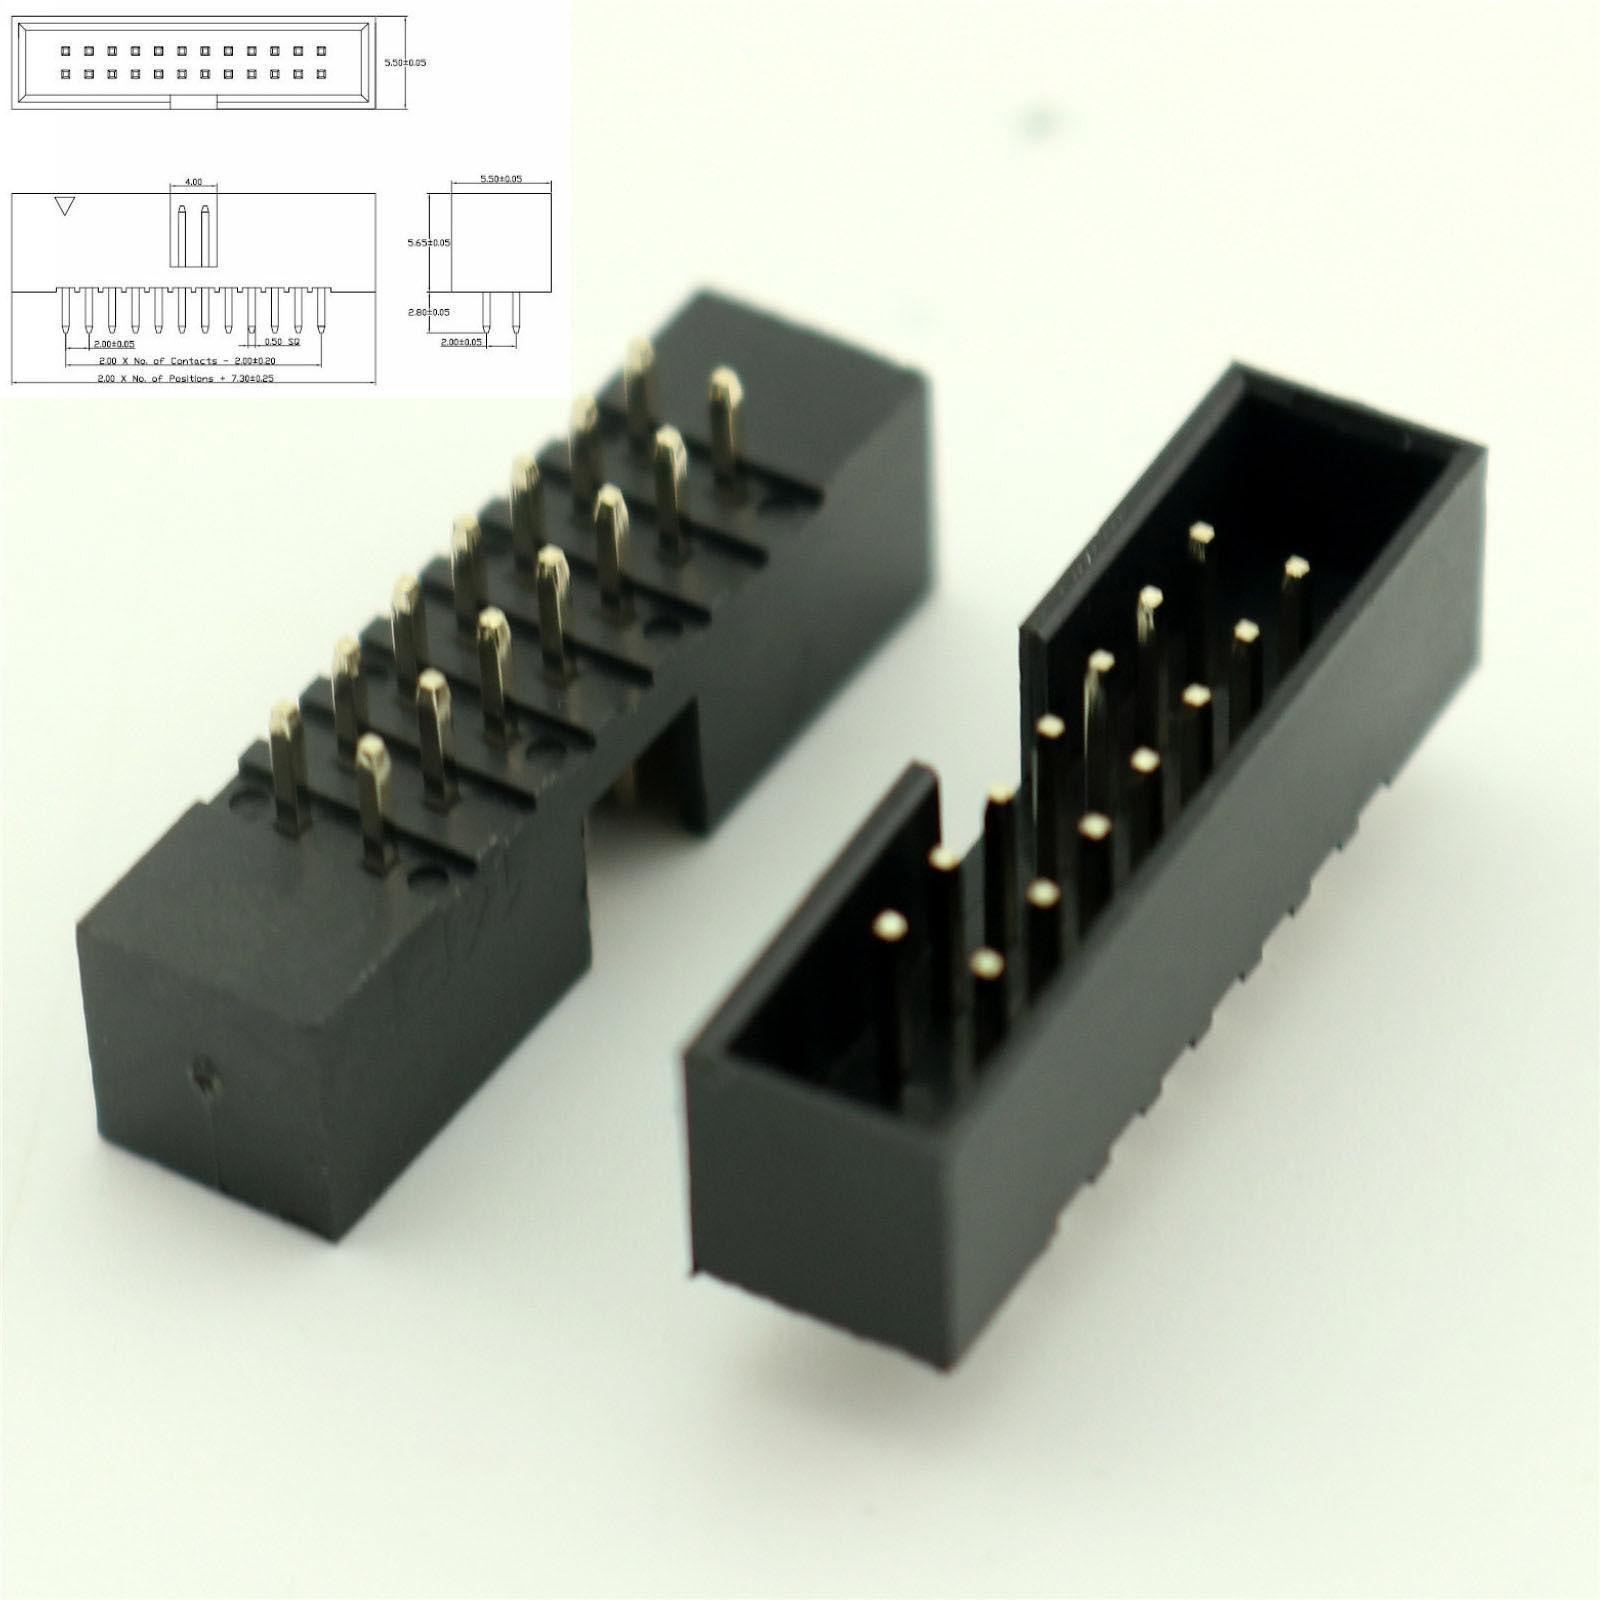 25 pcs 10 PIN 2 x 5 MALE PCB HEADERS